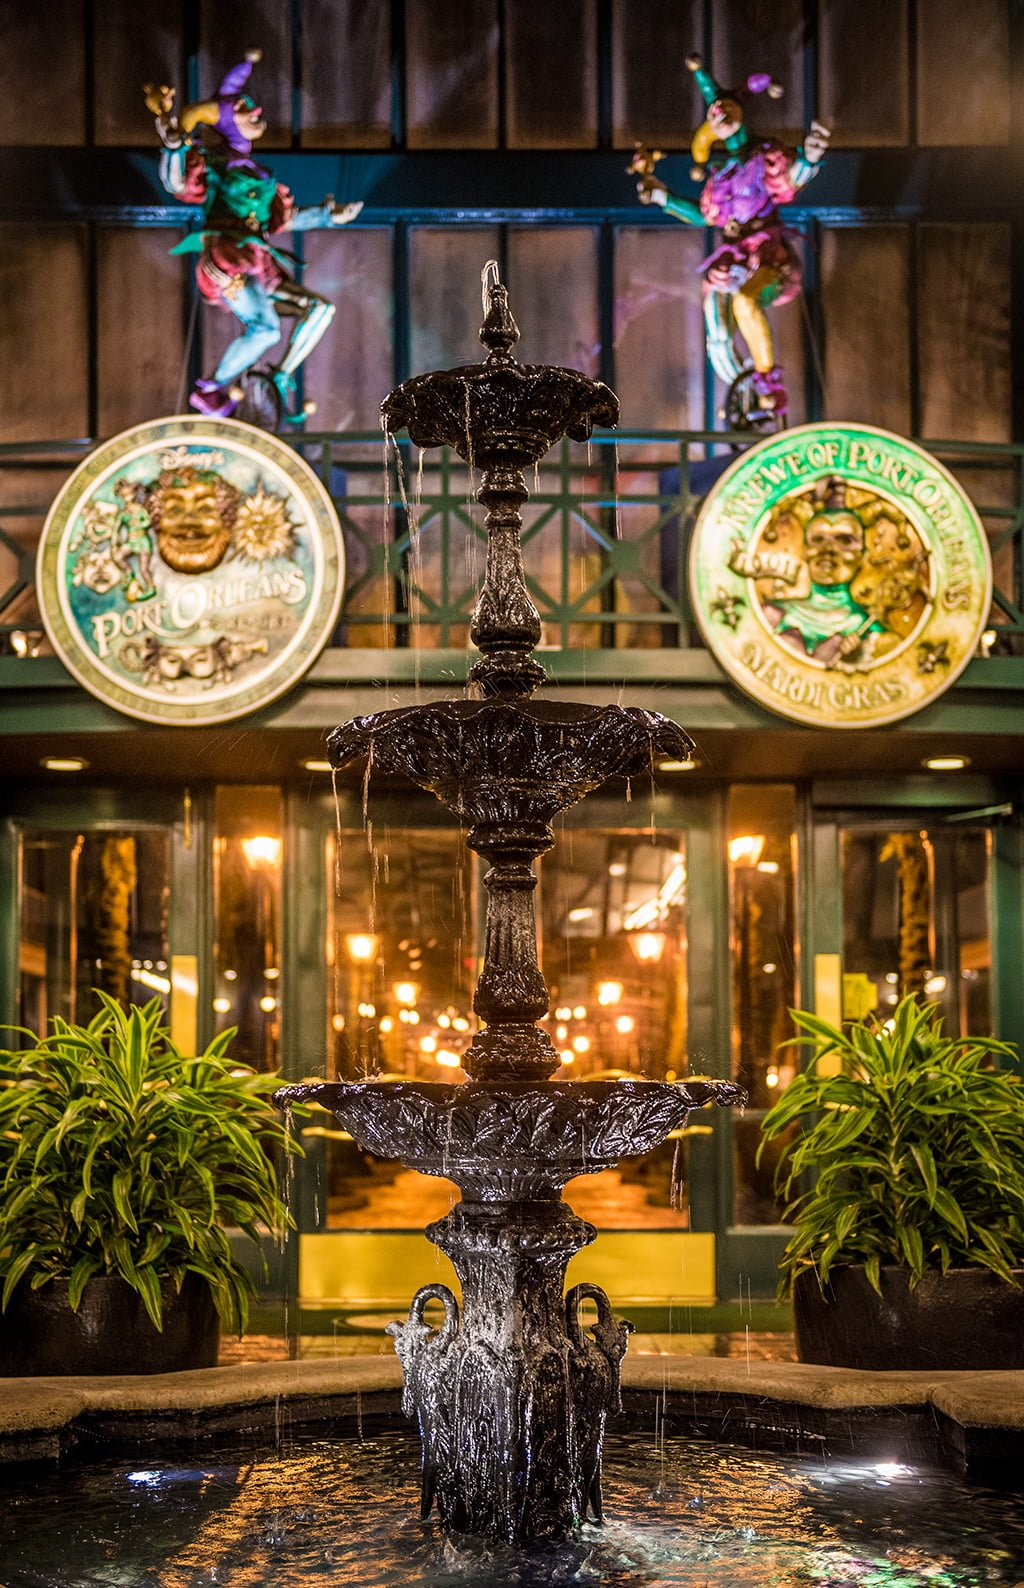 Disney S Port Orleans Resort French Quarter Review